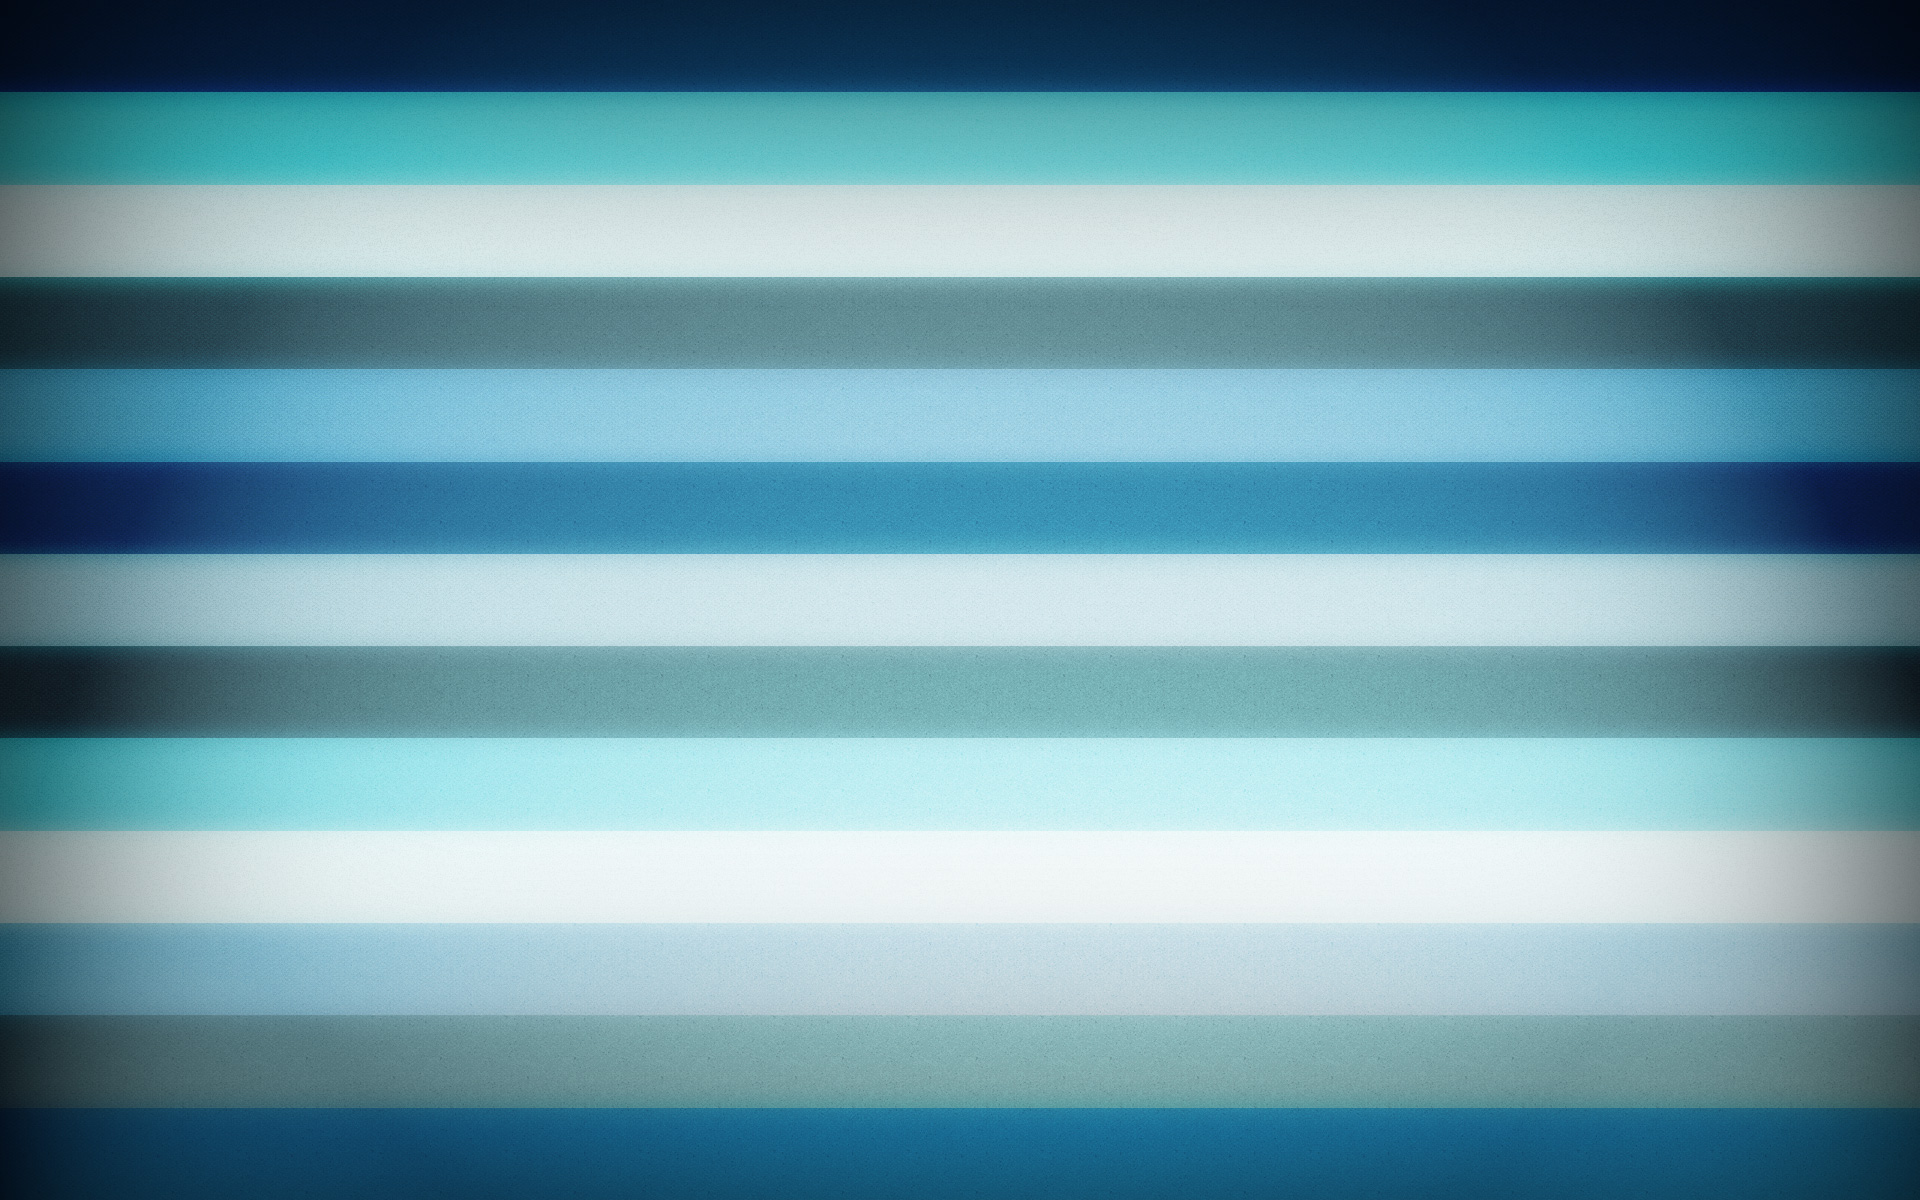 Wallpapers for Twitter Background - WallpaperSafari